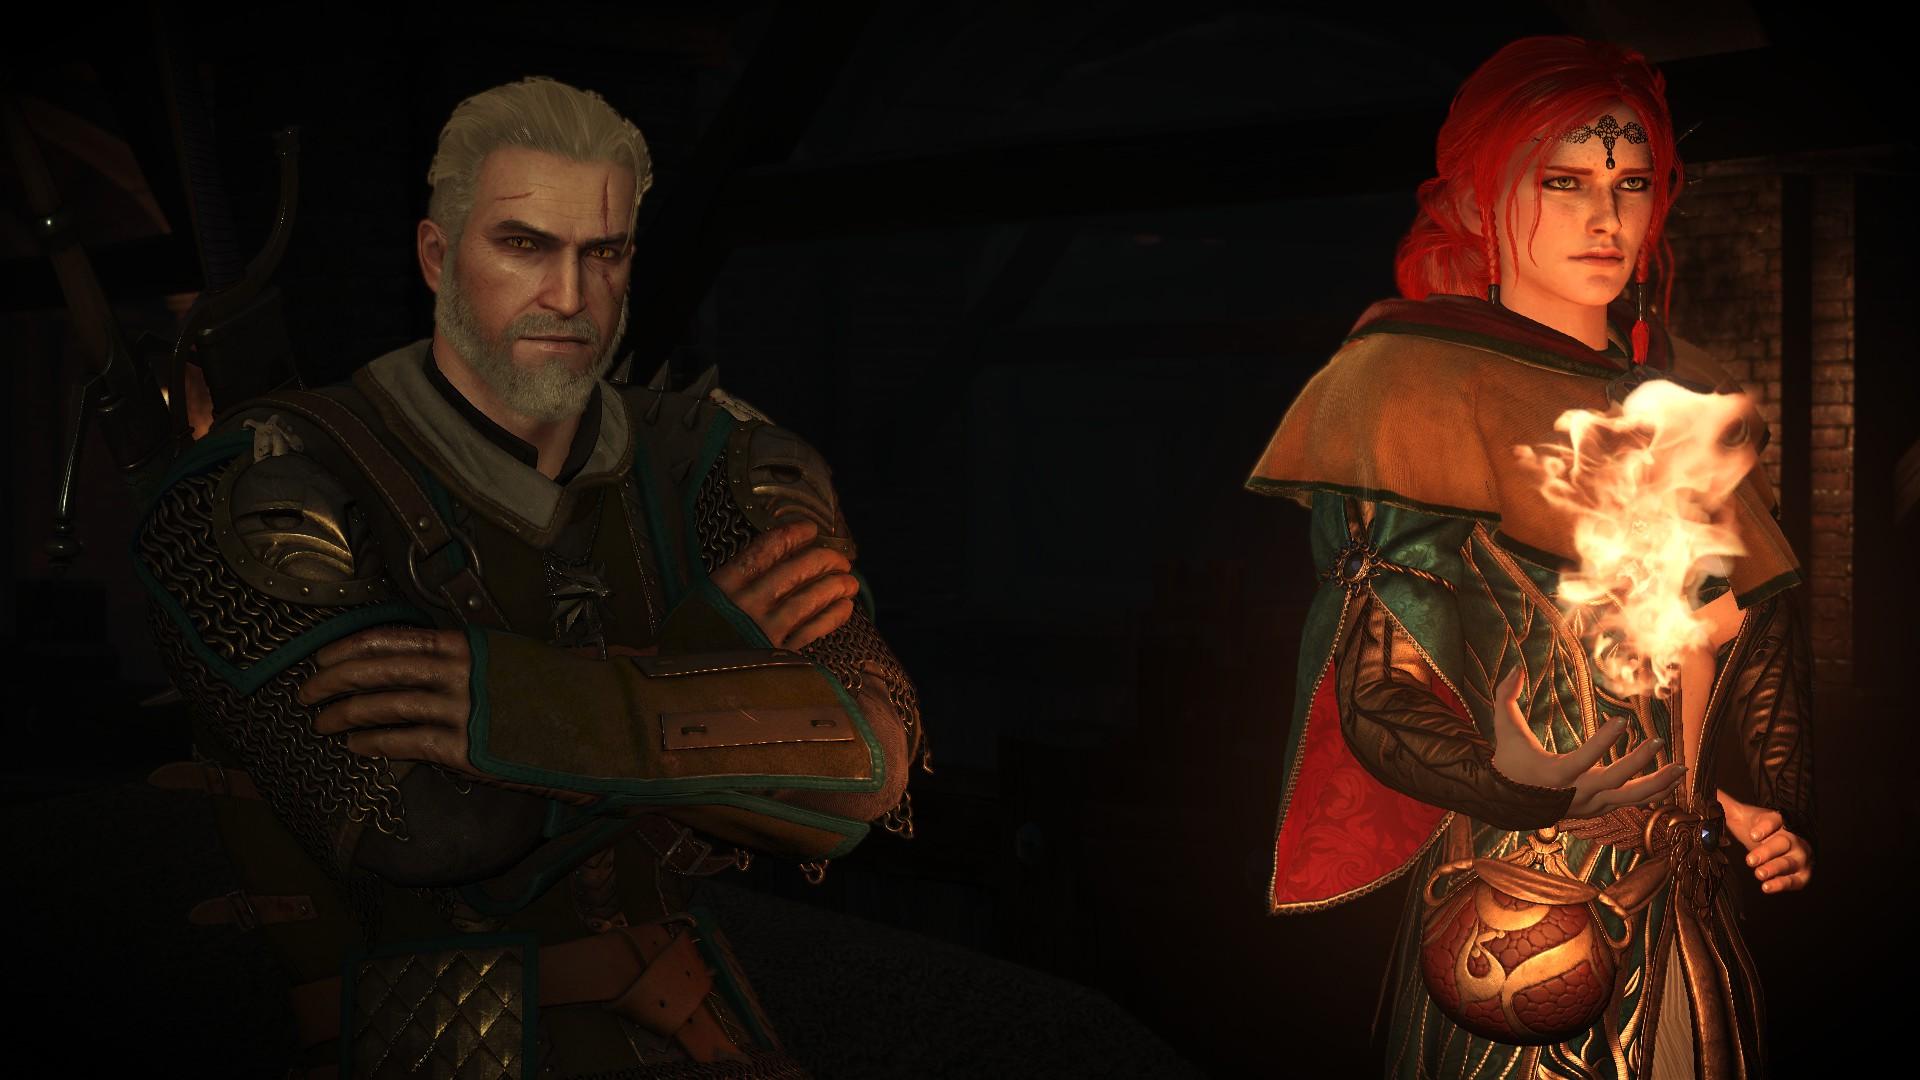 292030_screenshots_20170716232934_1.jpg - Witcher 3: Wild Hunt, the